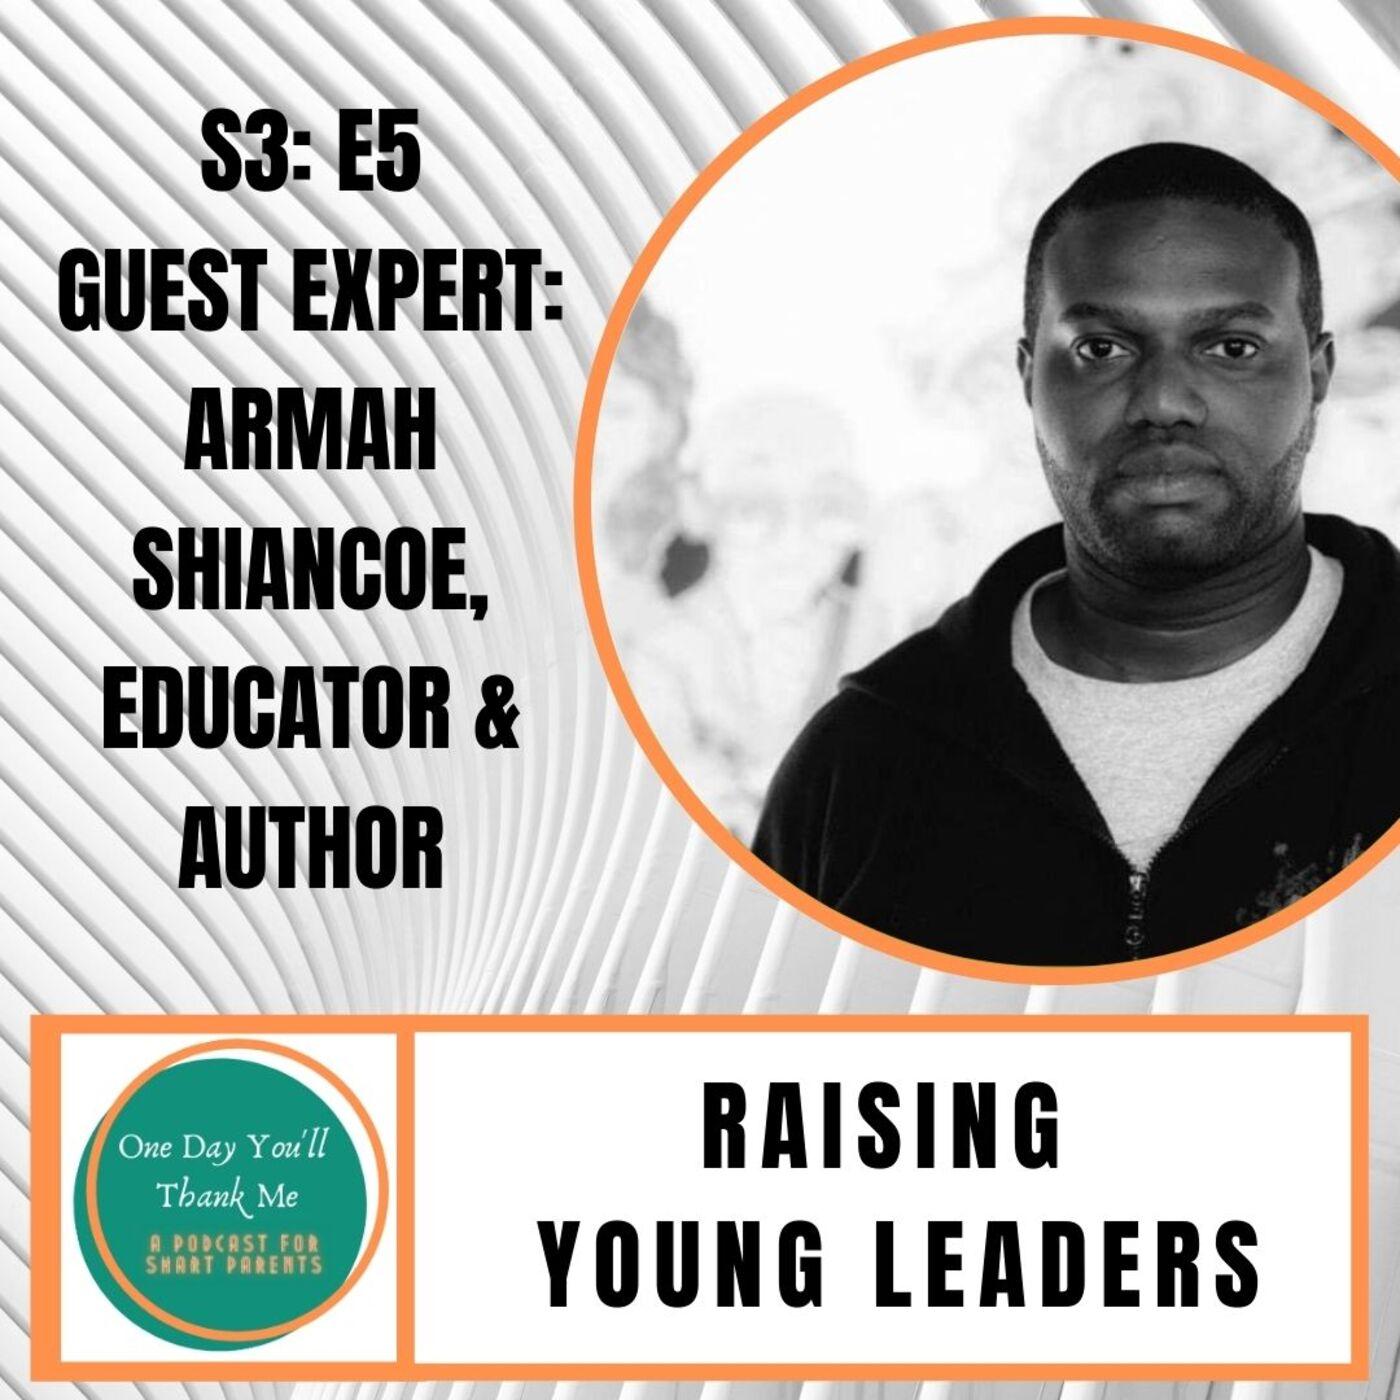 S3: E5 -- Guest Expert: Armah Shiancoe, Educator & Author, Raising Young Leaders